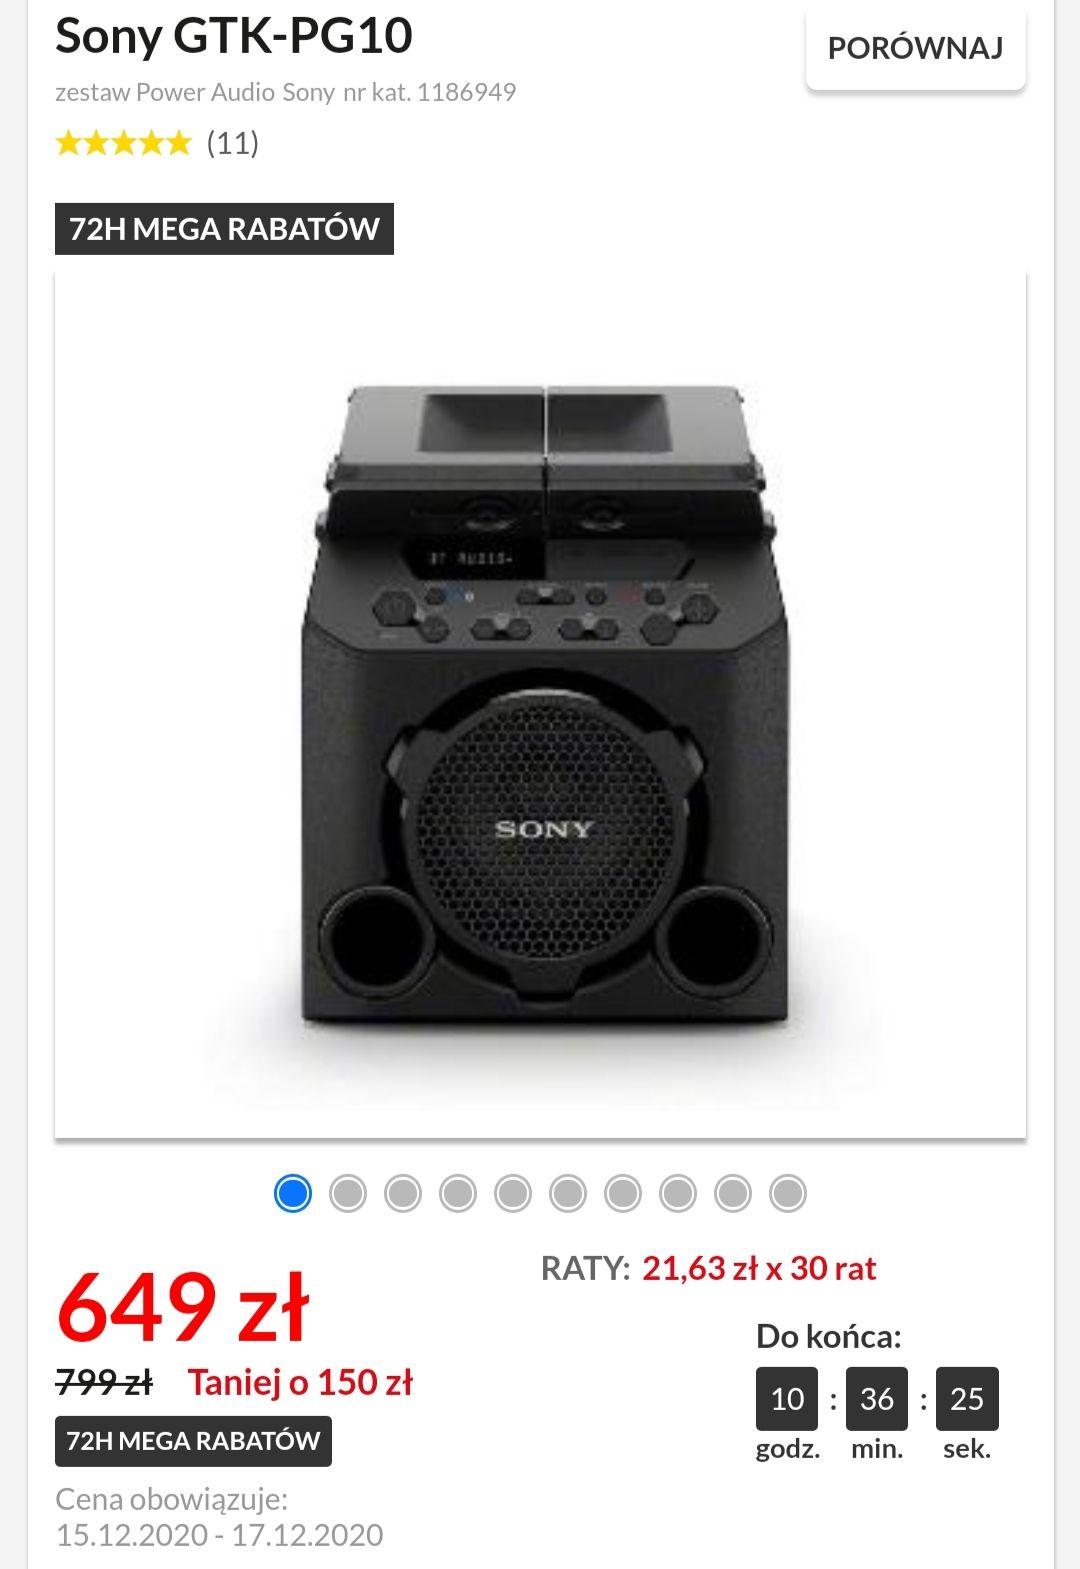 Głośnik Sony GTK-PG10